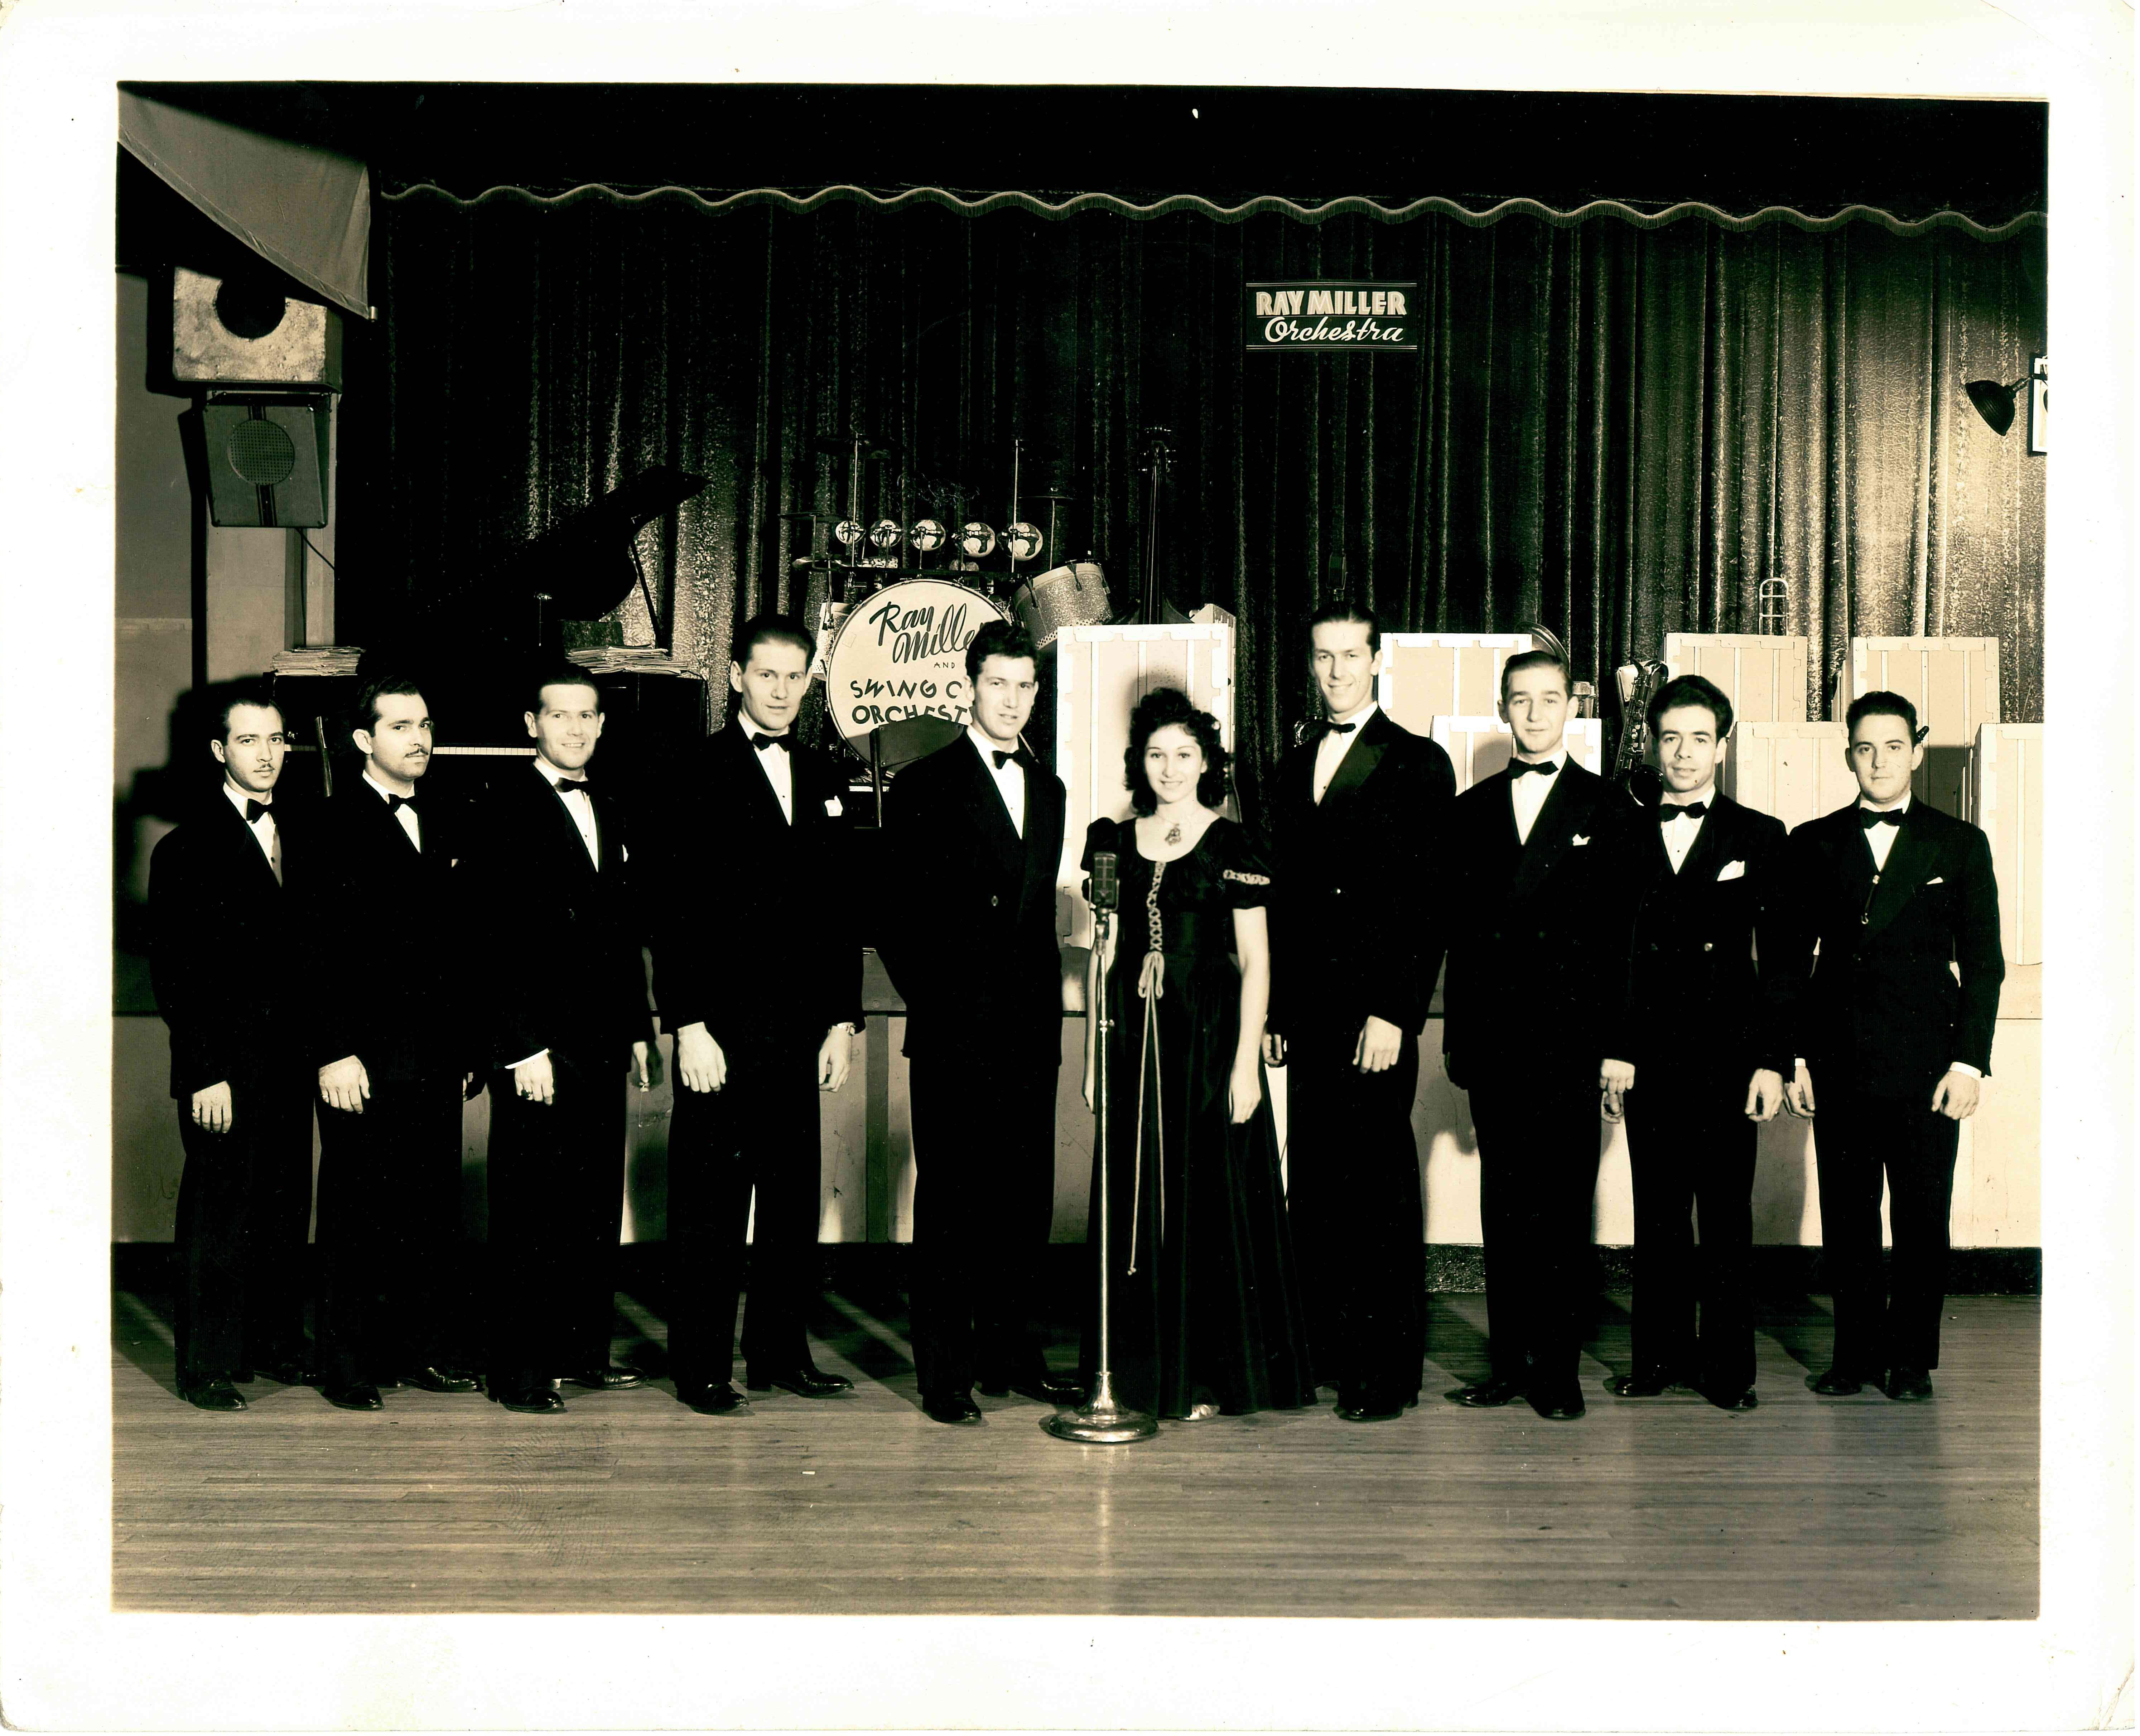 Glenn Miller Orchestra 1938 Ray miller orchestraGlenn Miller Orchestra 1938